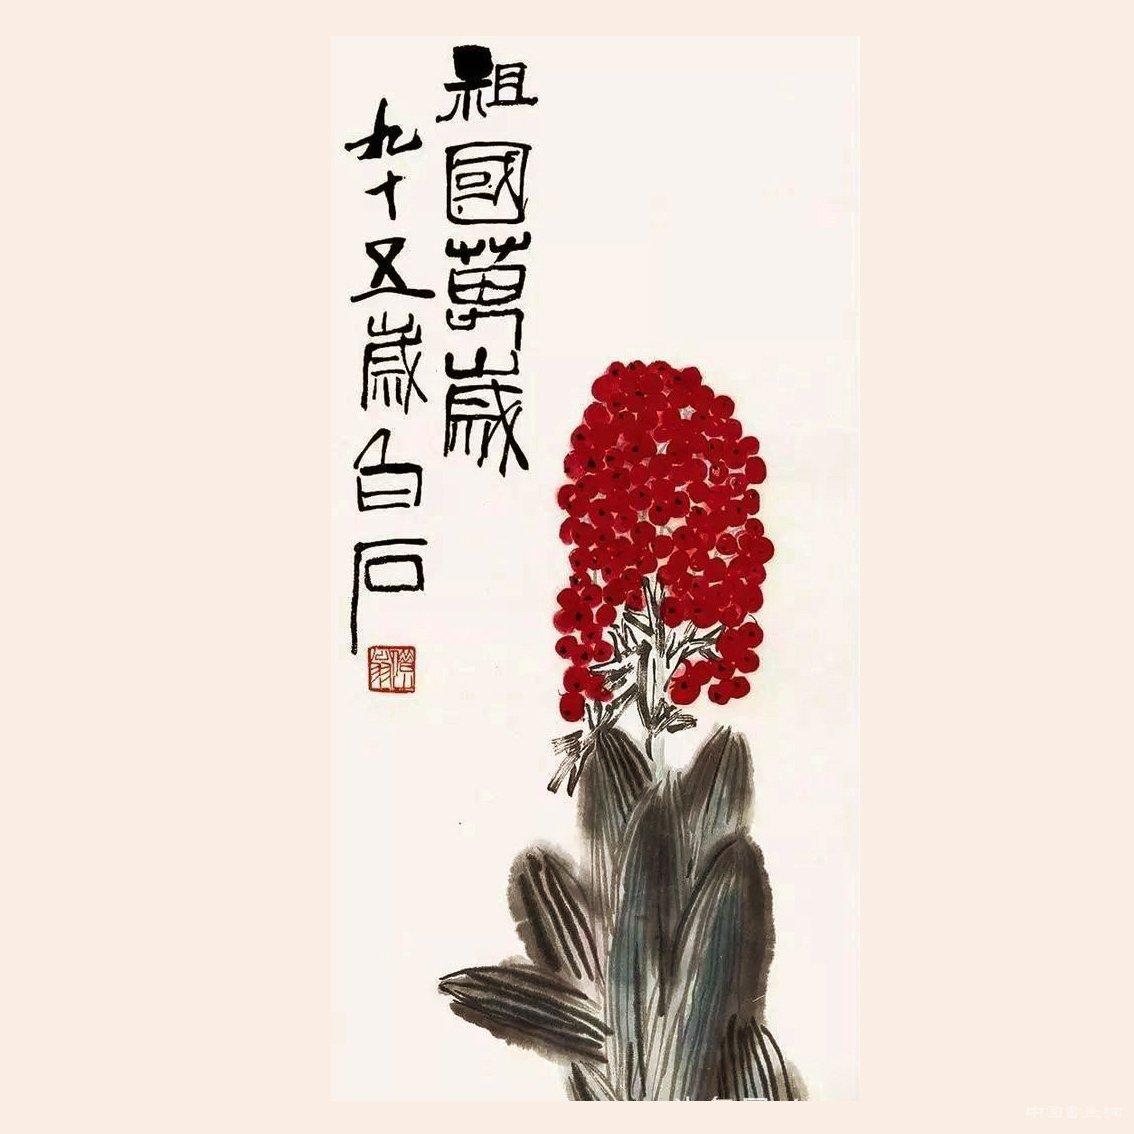 <b>七十正芳华:画家笔下的国庆节</b>